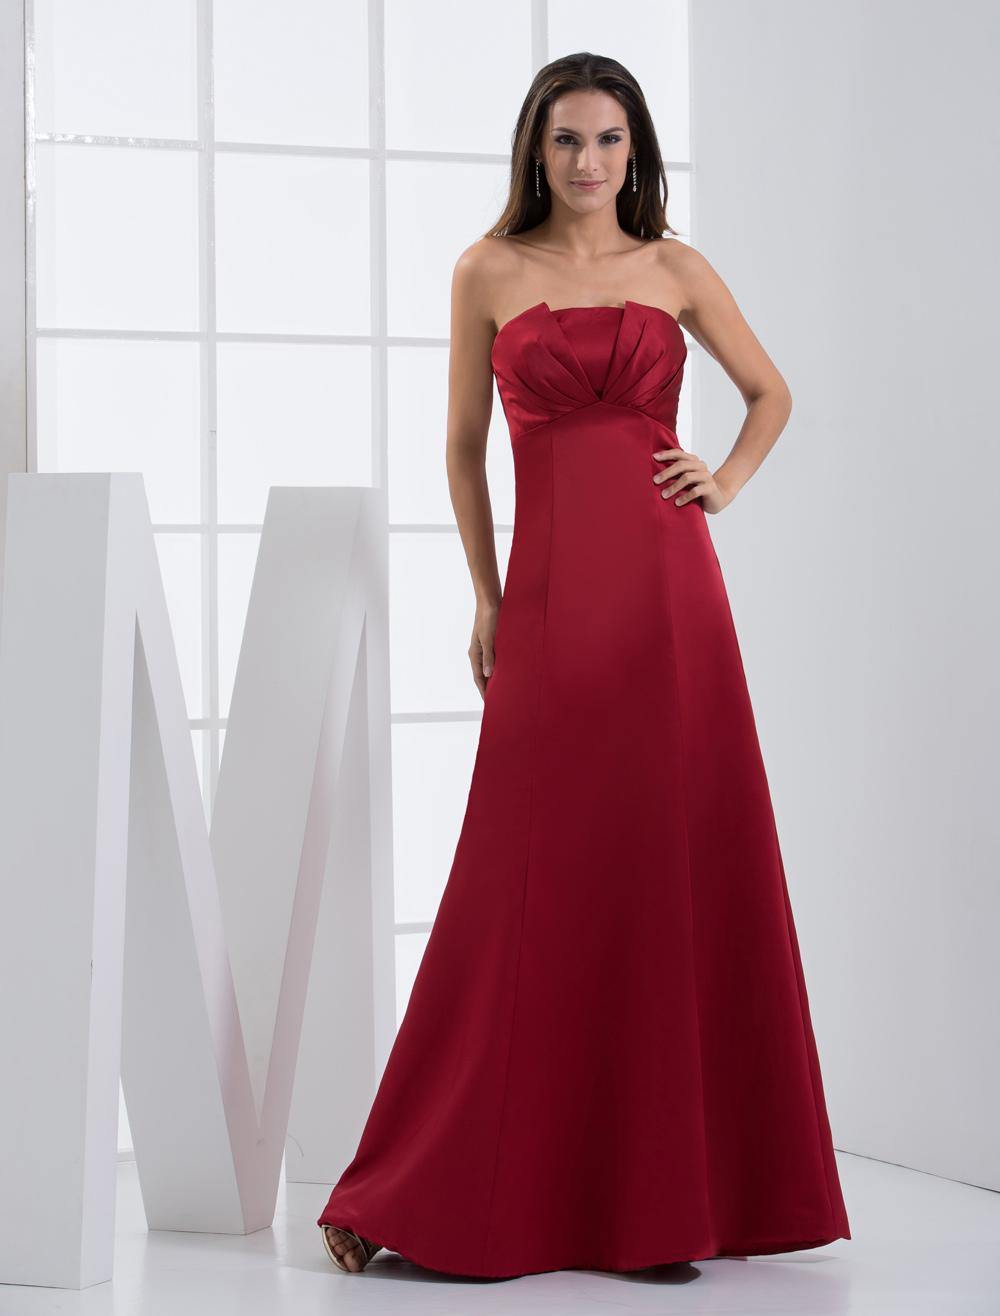 Strapless Bridesmaid Dress Ruby Satin A line Floor Length Prom Dress